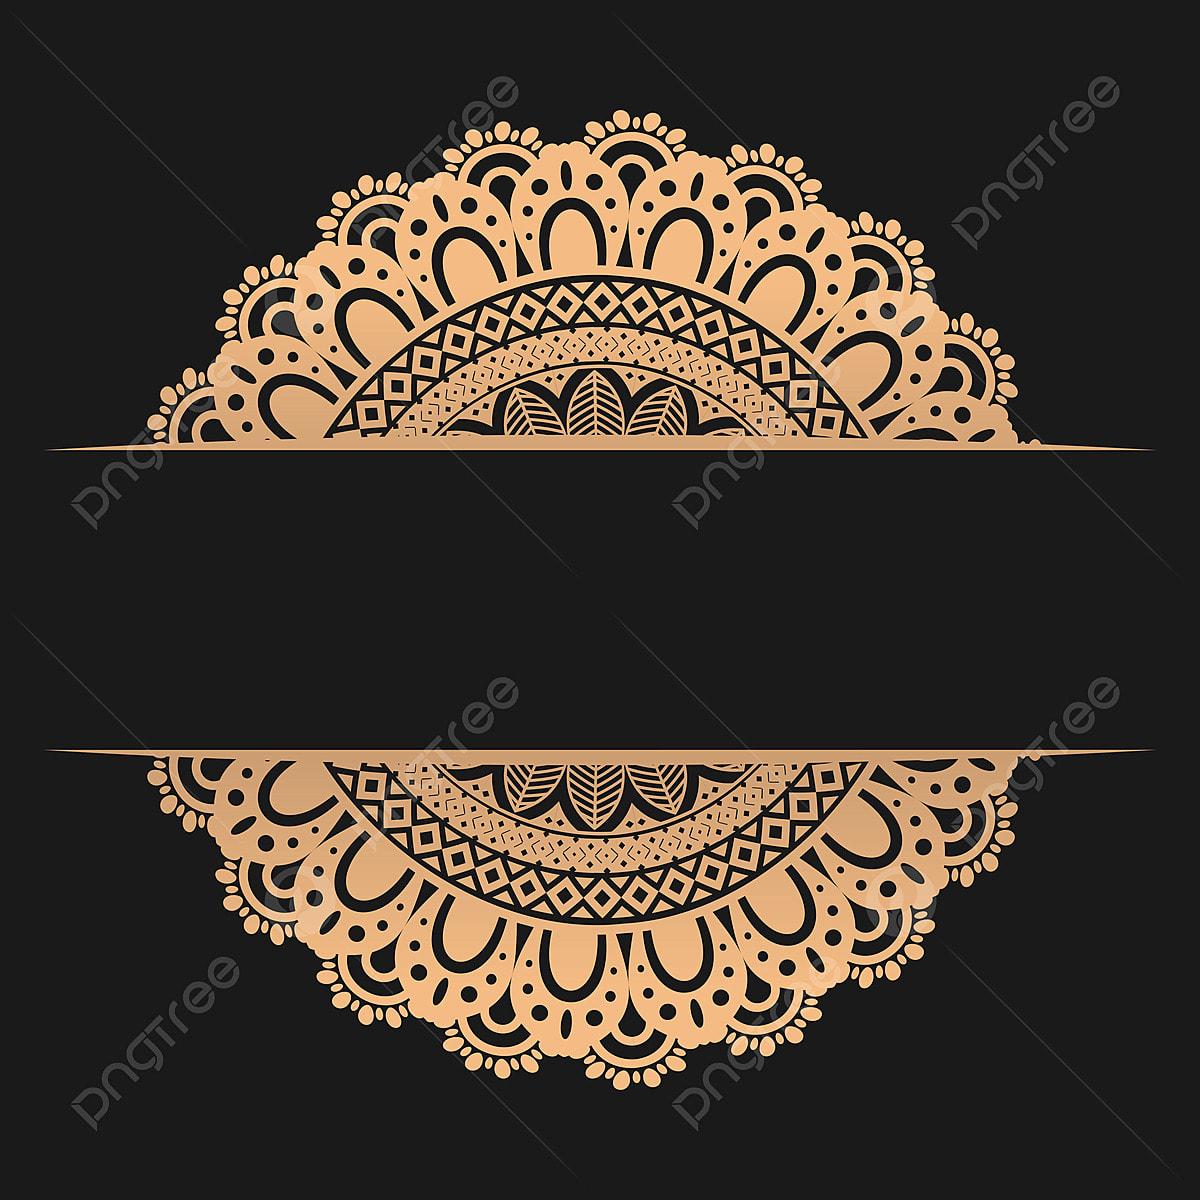 Desenho De Mandala Dourada Abstract Arabesco Arabe Png E Vetor